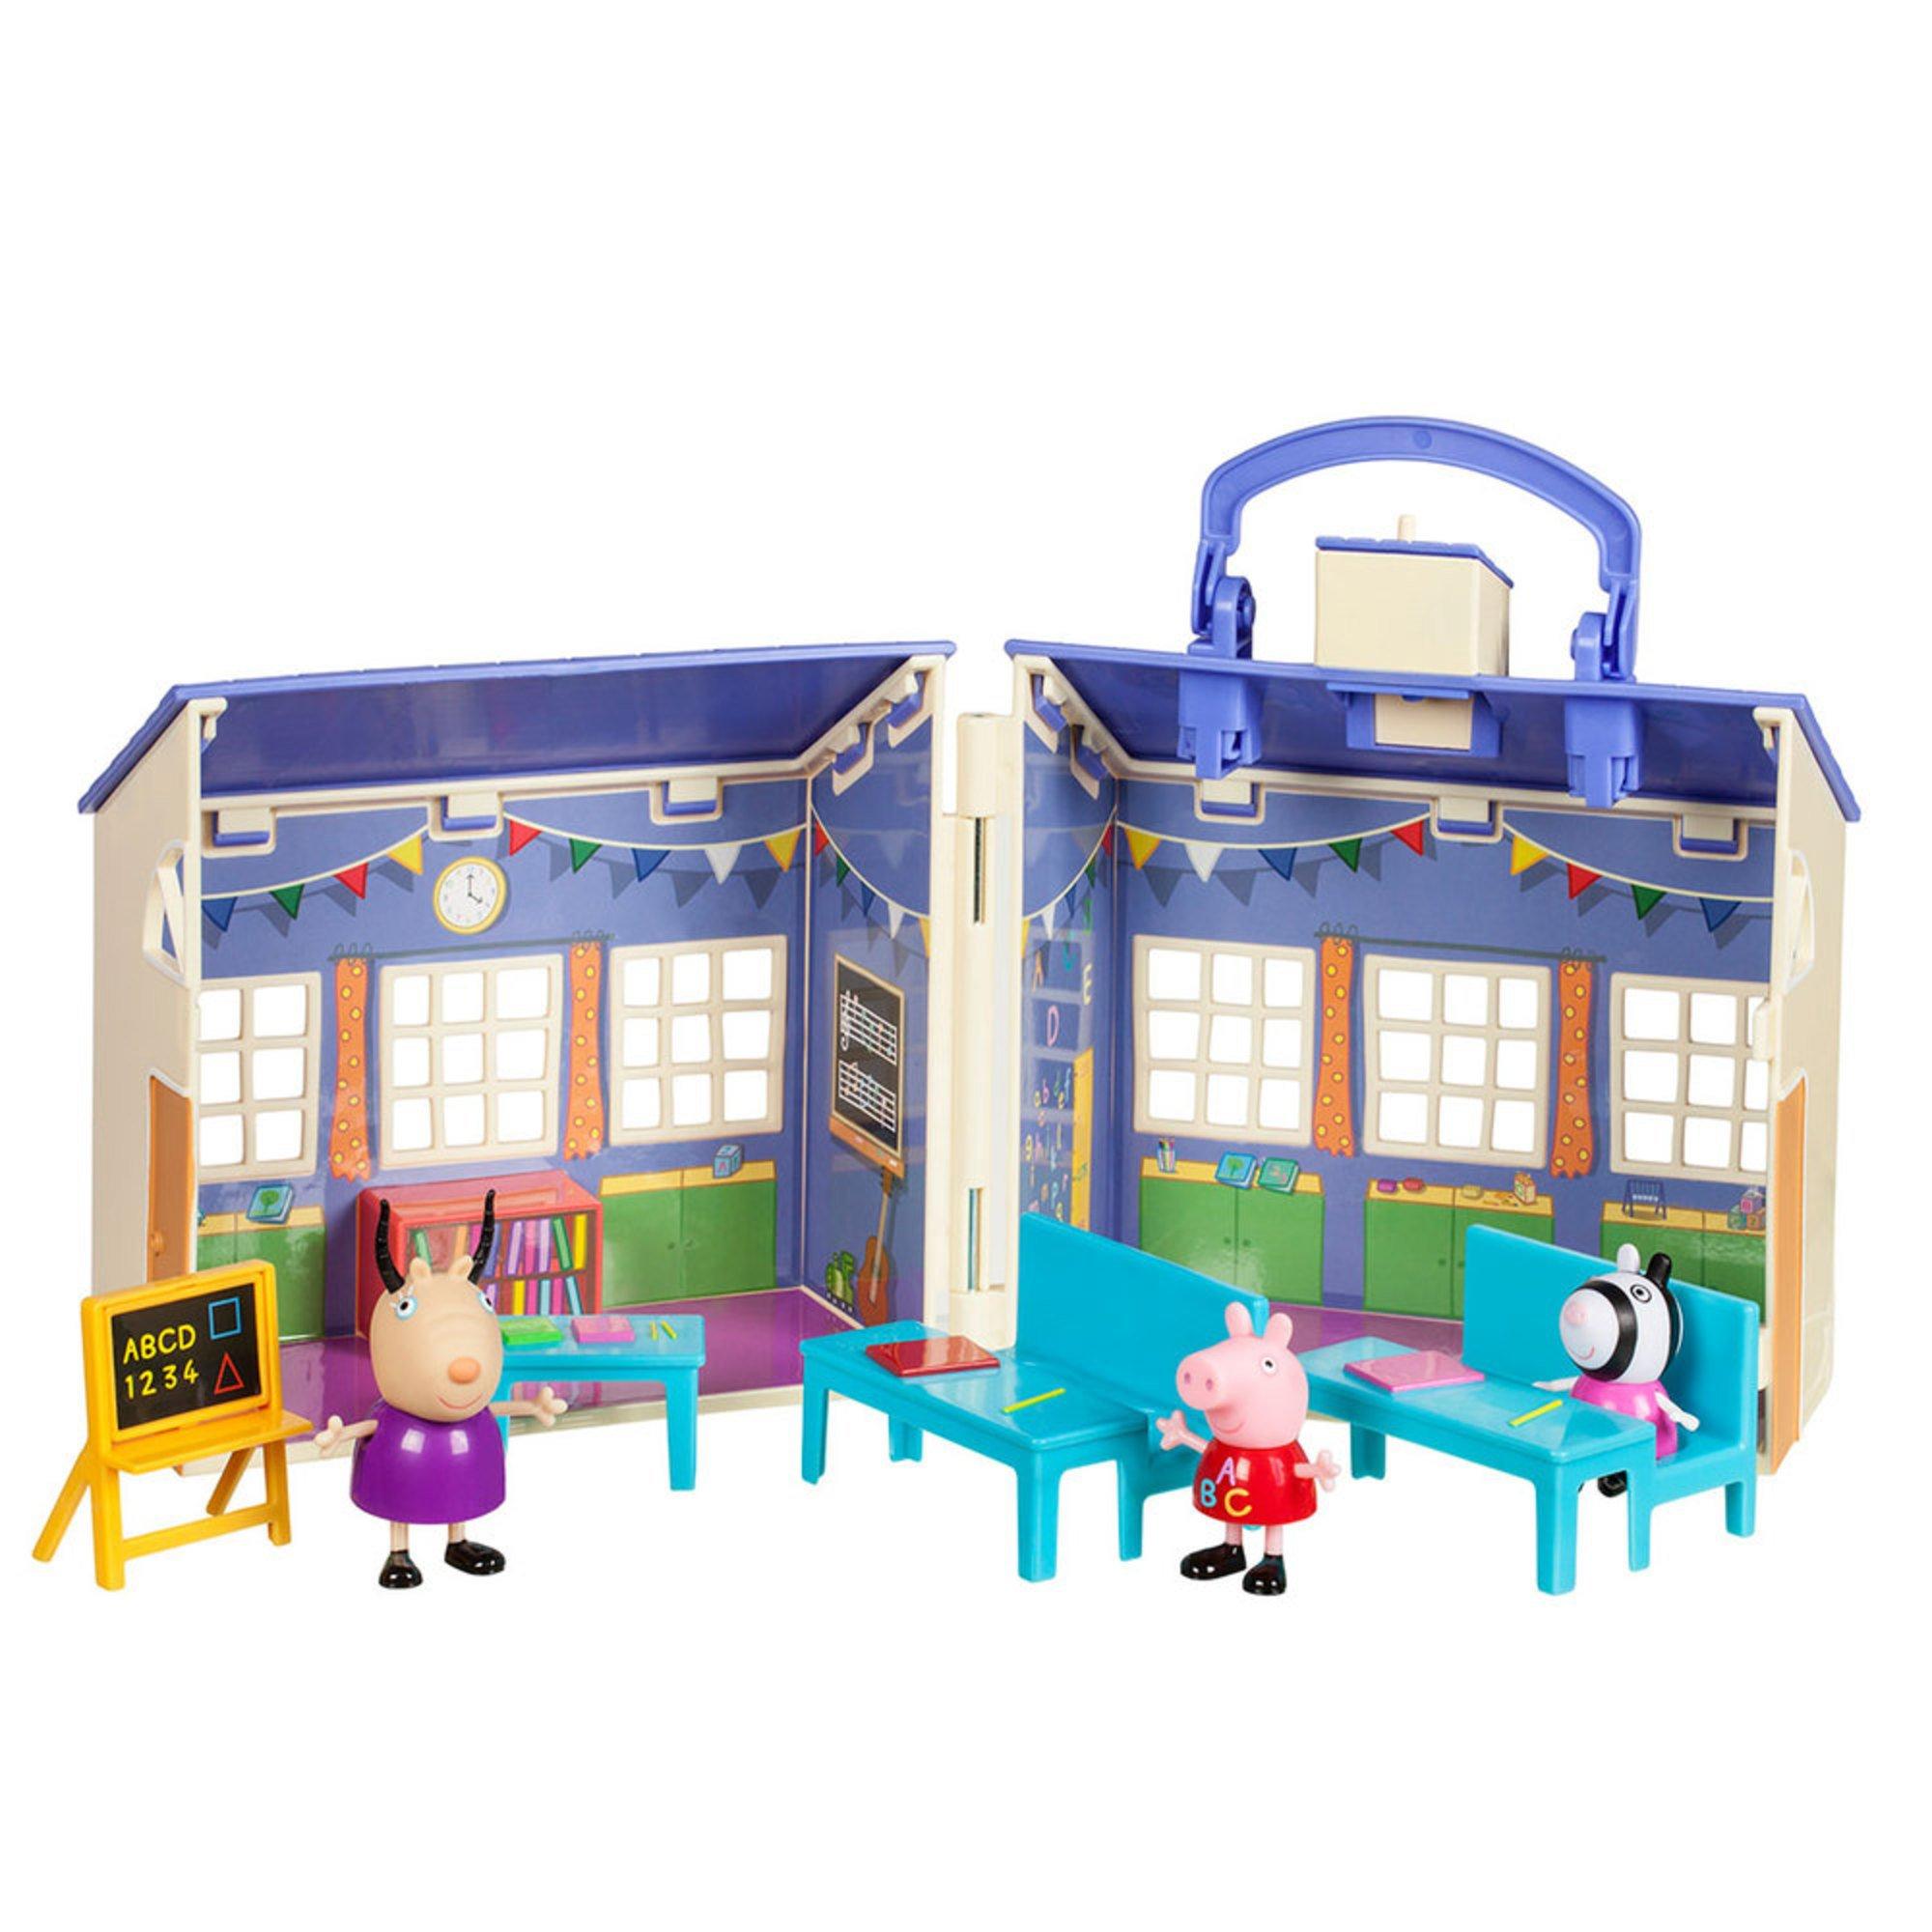 Peppa Pig Peppa's Deluxe School House Playset | Early ...